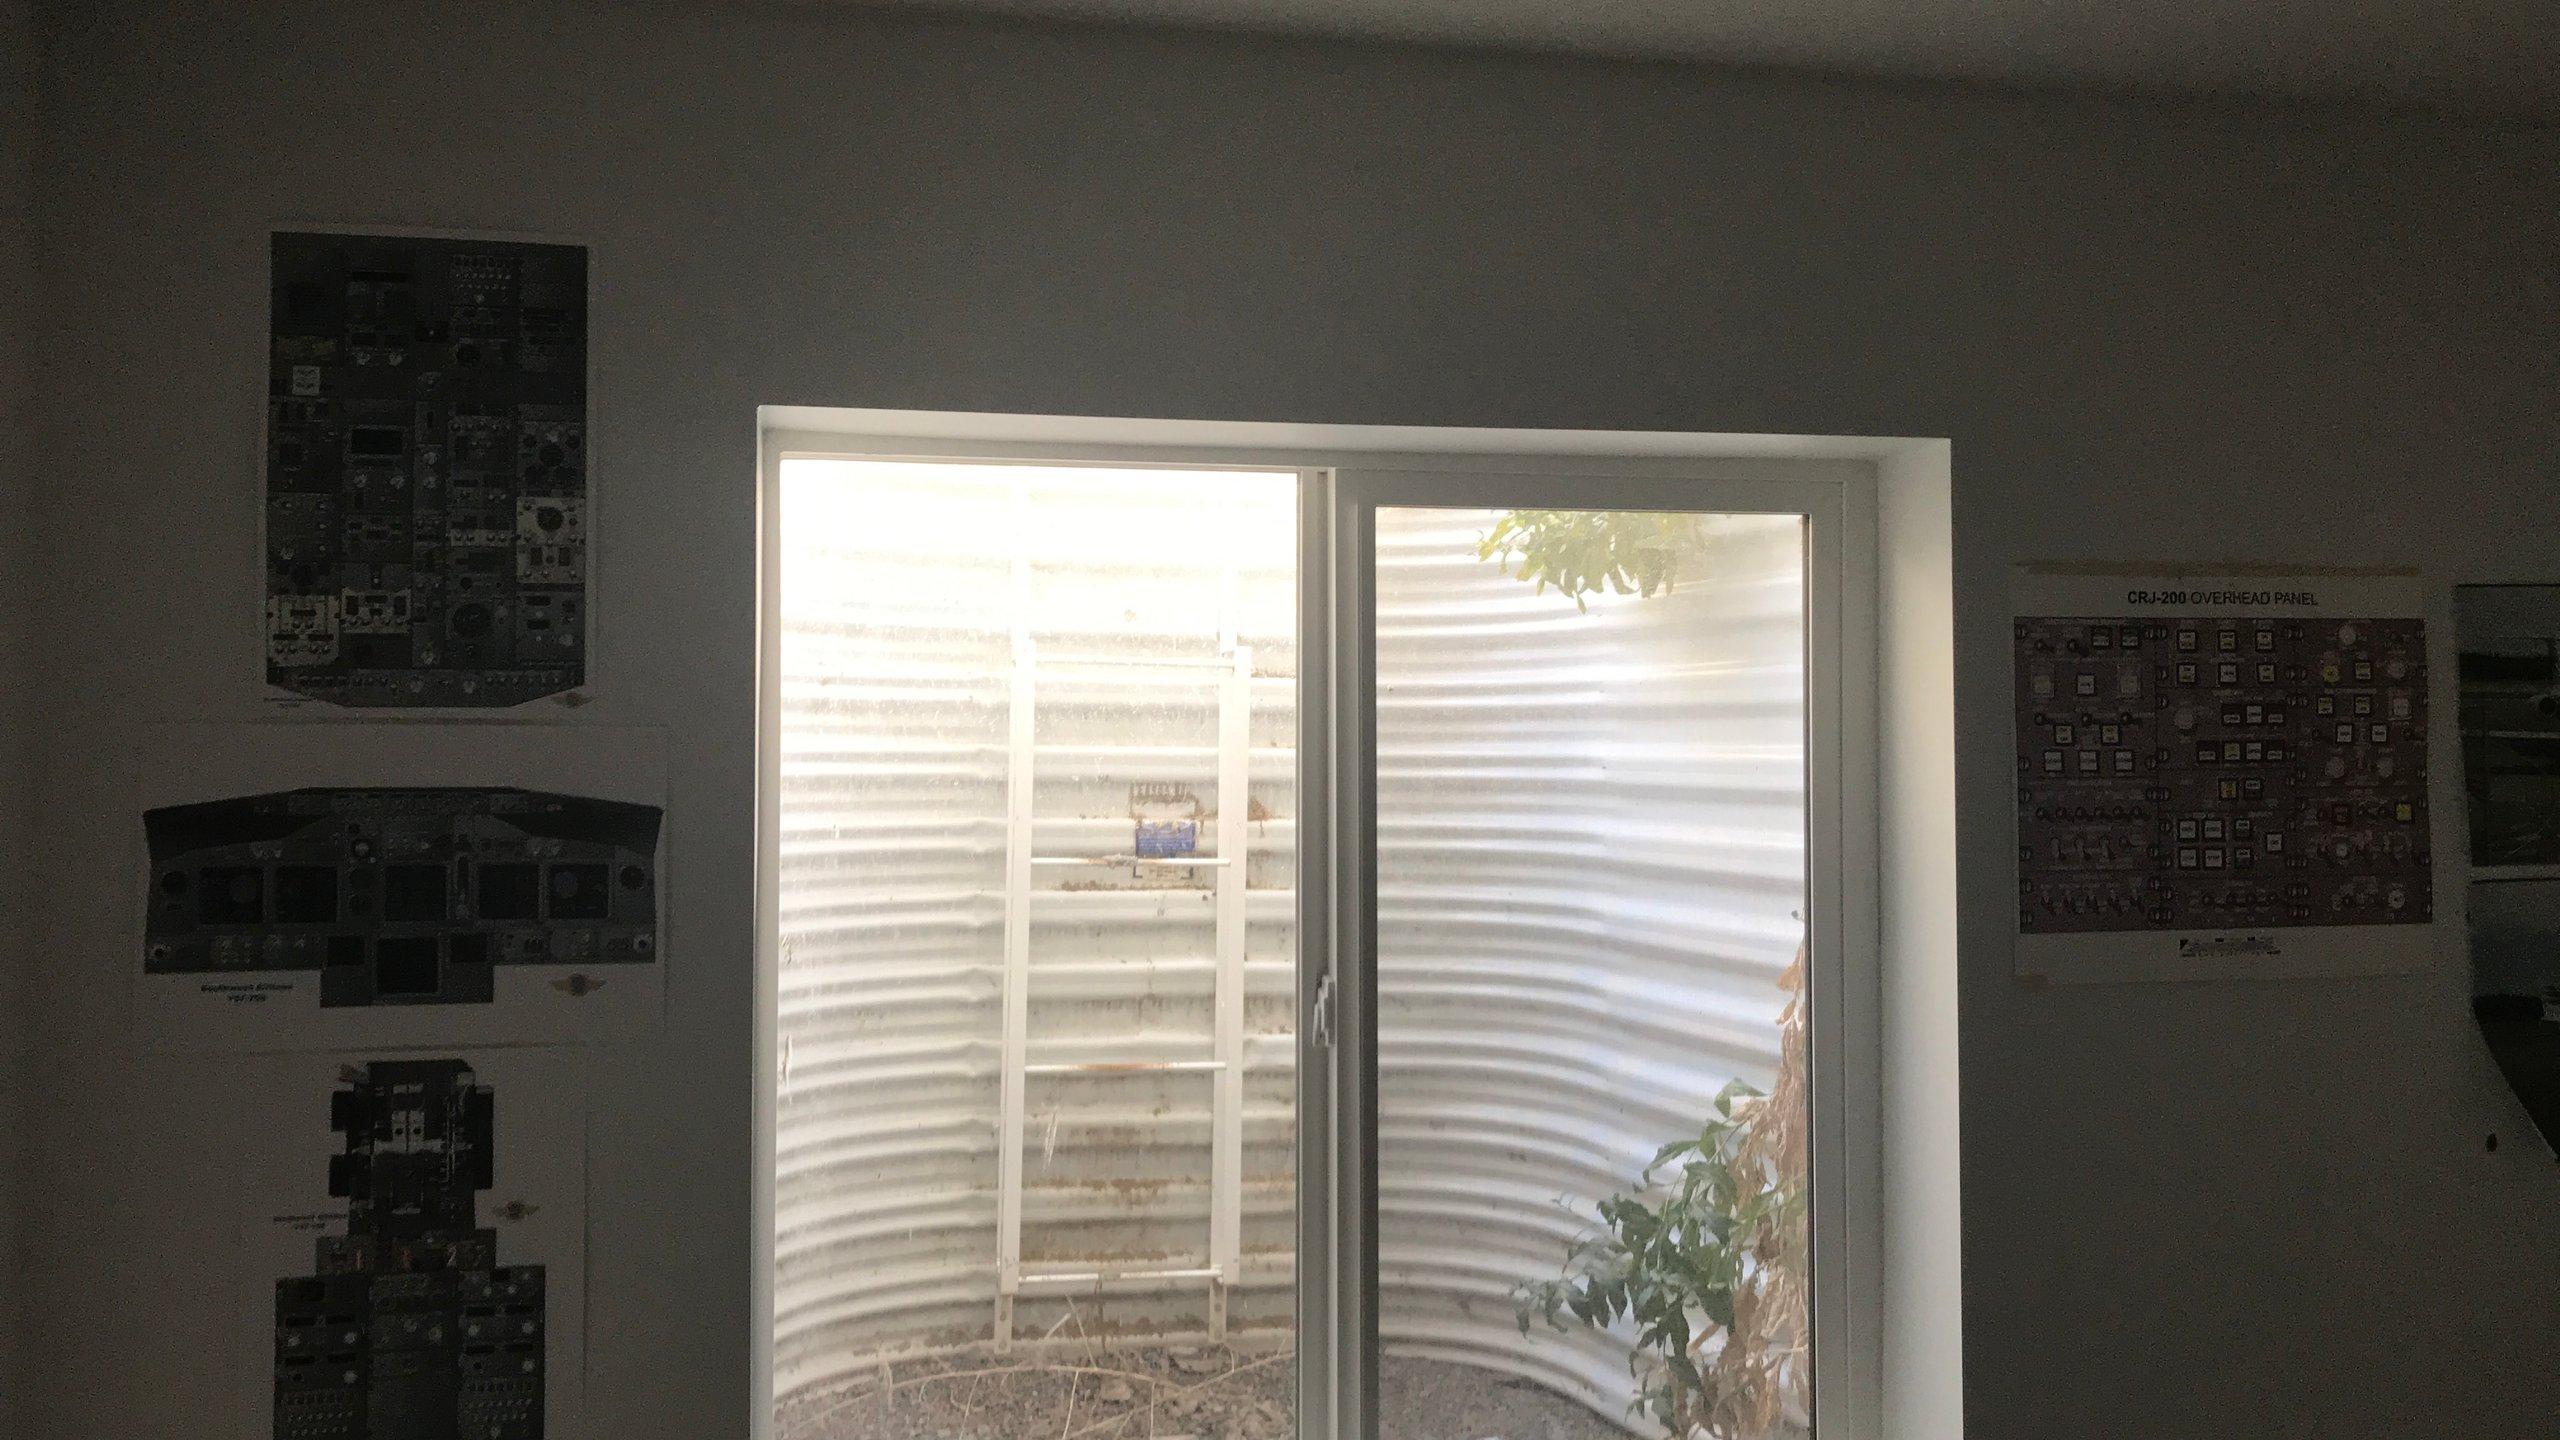 12x11 Bedroom self storage unit